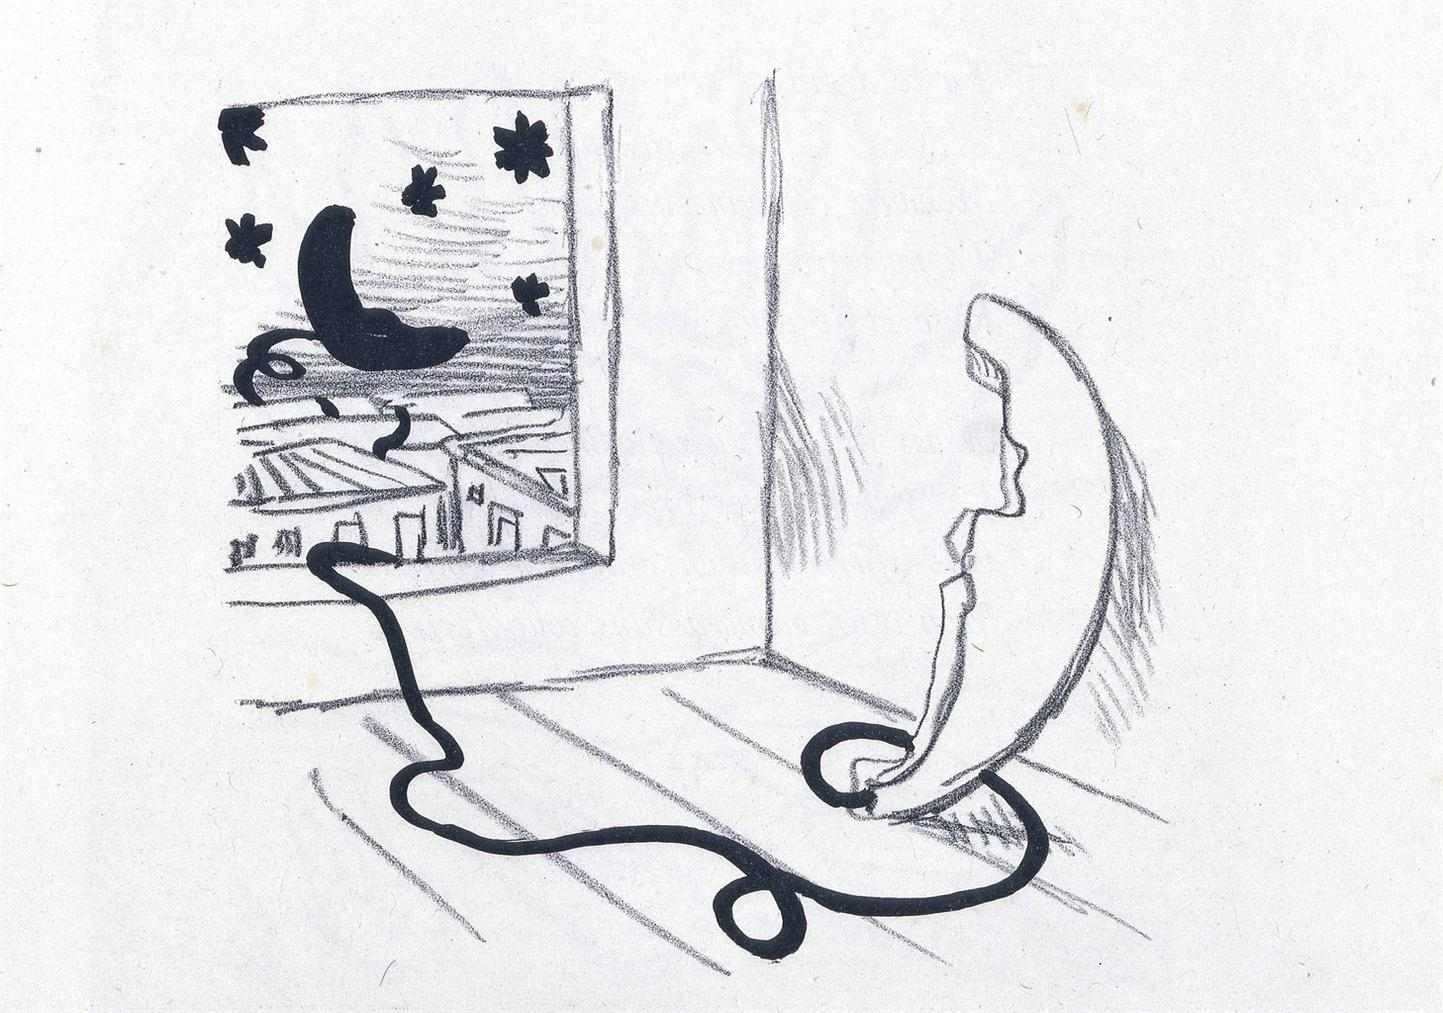 Giorgio de Chirico-Guillaume Apollinaire, Calligrammes, Nrf, Paris-1930